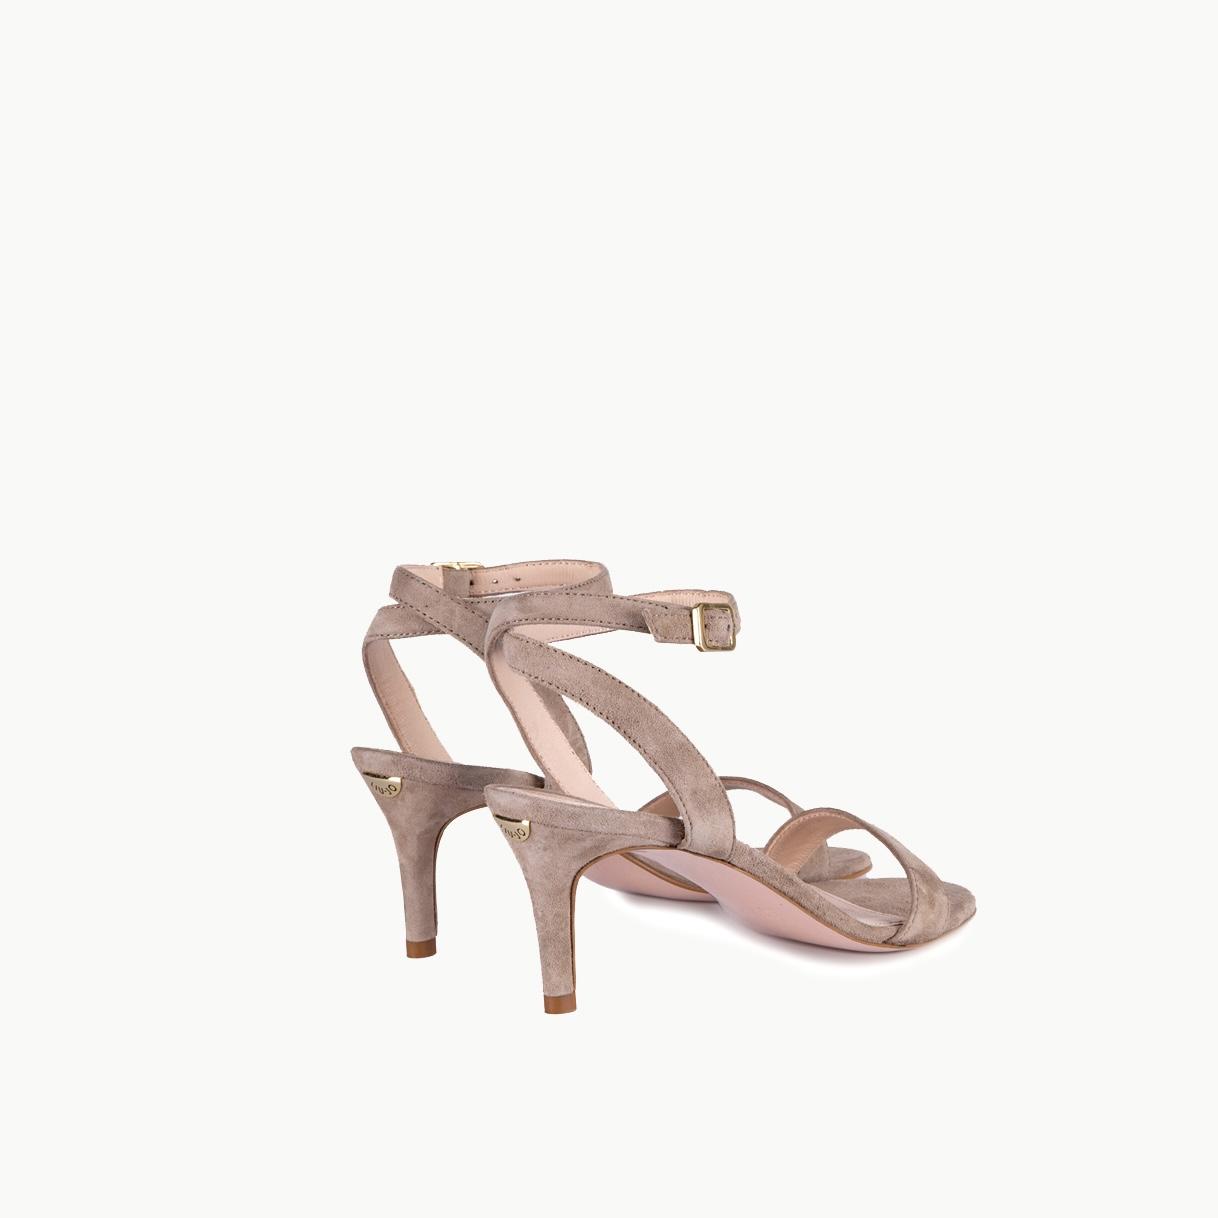 Sandali tacco basso - LIU JO